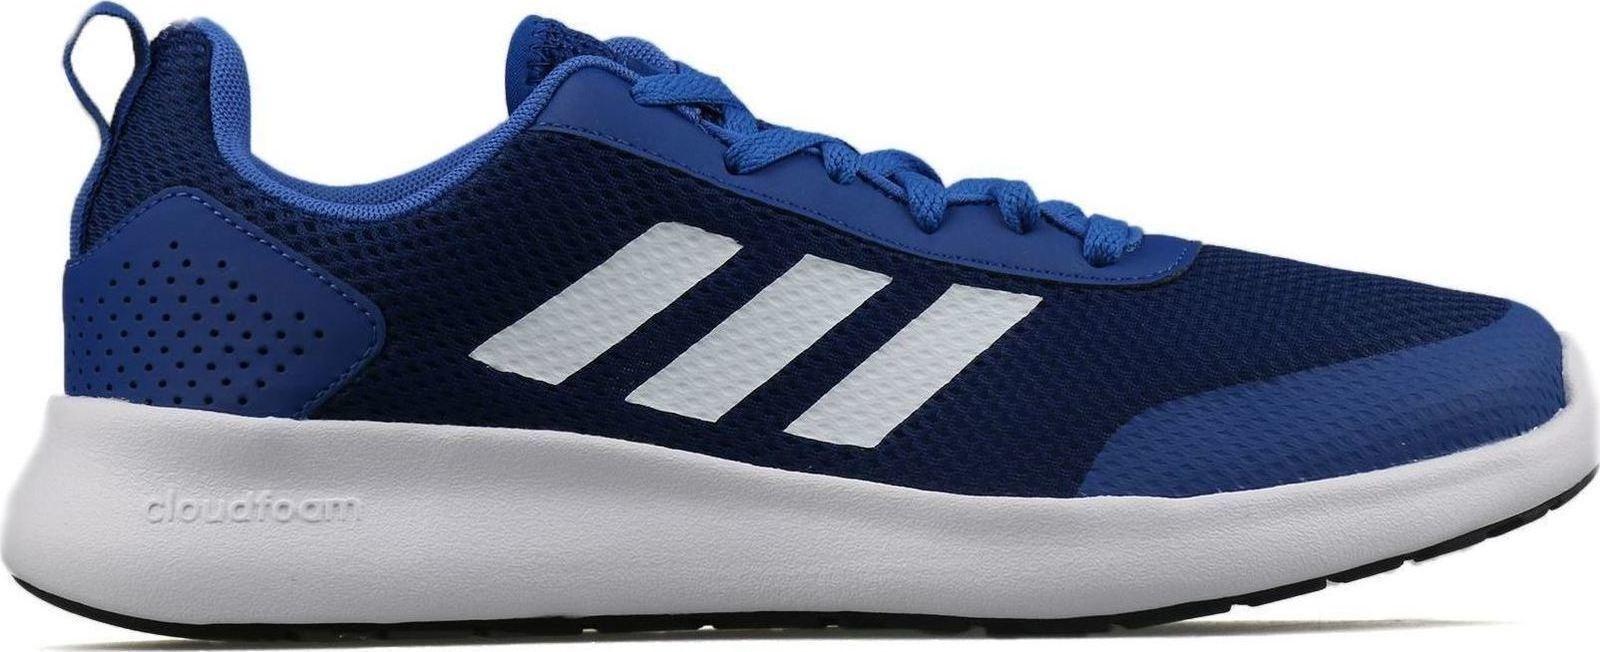 a63d648a562b10 adidas element - Αθλητικά Παπούτσια - Skroutz.gr